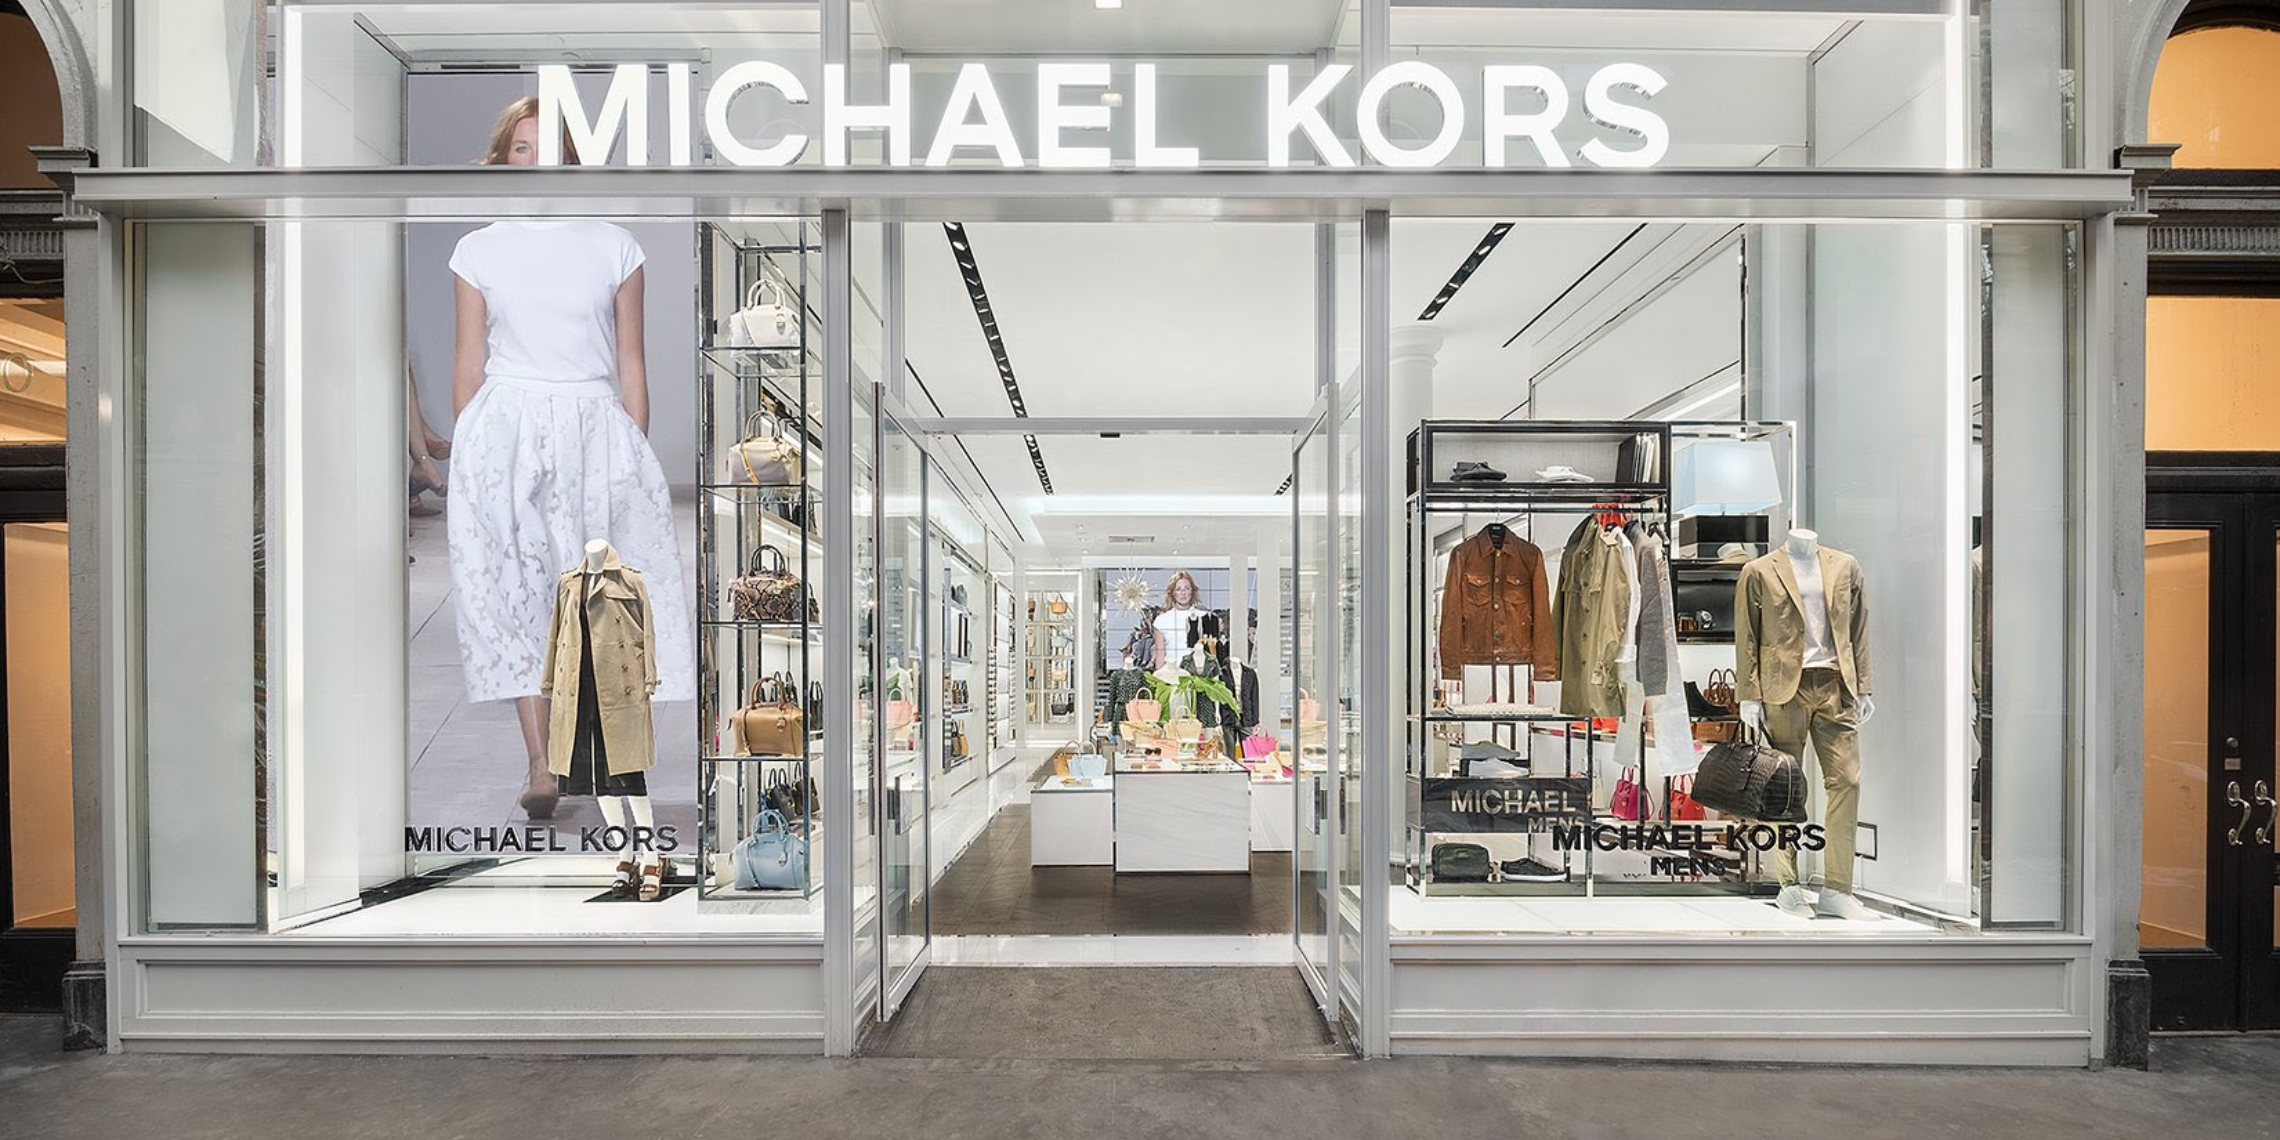 Michael Kors at 10 Columbus Cir in New York, NY | Designer ...